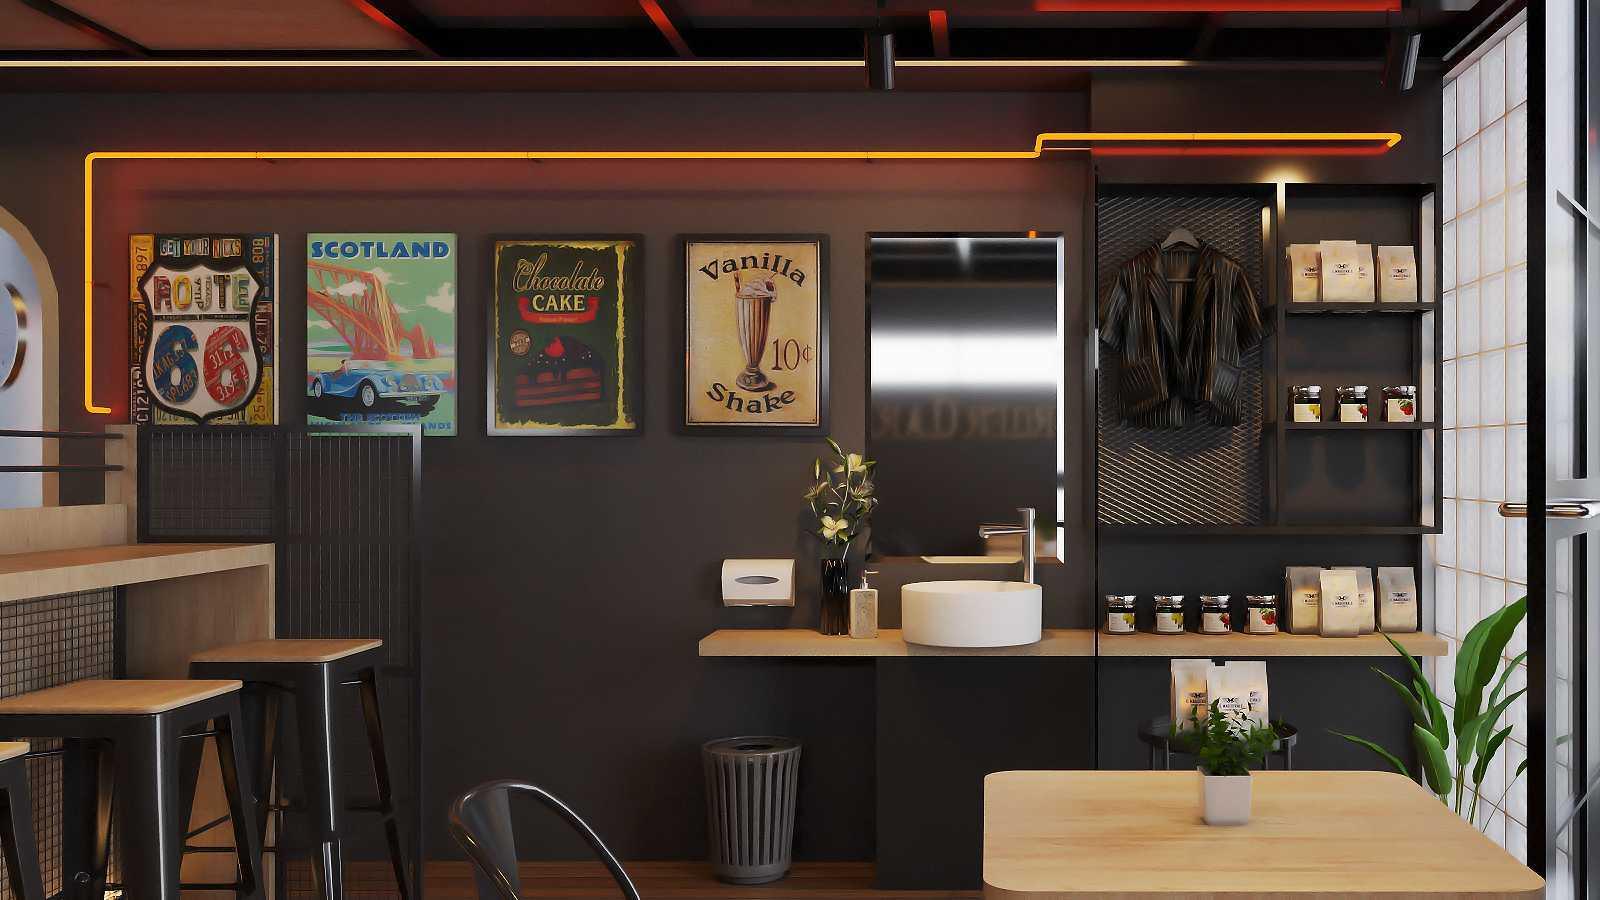 Sections Design & Architecture Premium Burger Restaurant Project (Cipete) Jl. Cipete Raya, Cipete Sel., Kec. Cilandak, Kota Jakarta Selatan, Daerah Khusus Ibukota Jakarta, Indonesia Jl. Cipete Raya, Cipete Sel., Kec. Cilandak, Kota Jakarta Selatan, Daerah Khusus Ibukota Jakarta, Indonesia Sections-Design-Architecture-Premium-Burger-Restaurant-Project-Cipete  123199